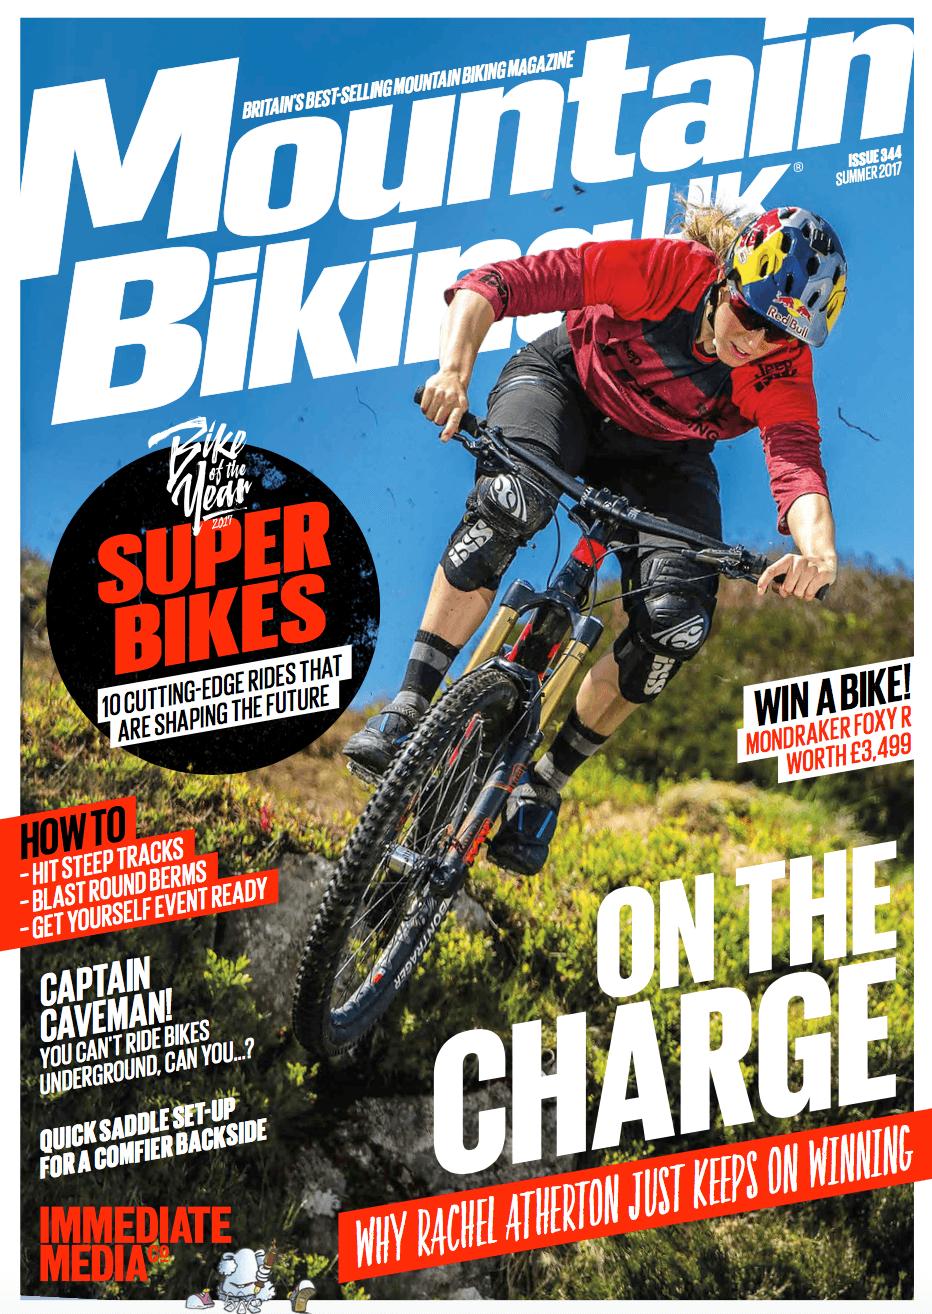 Mountain Biking UK Issue 344 cover